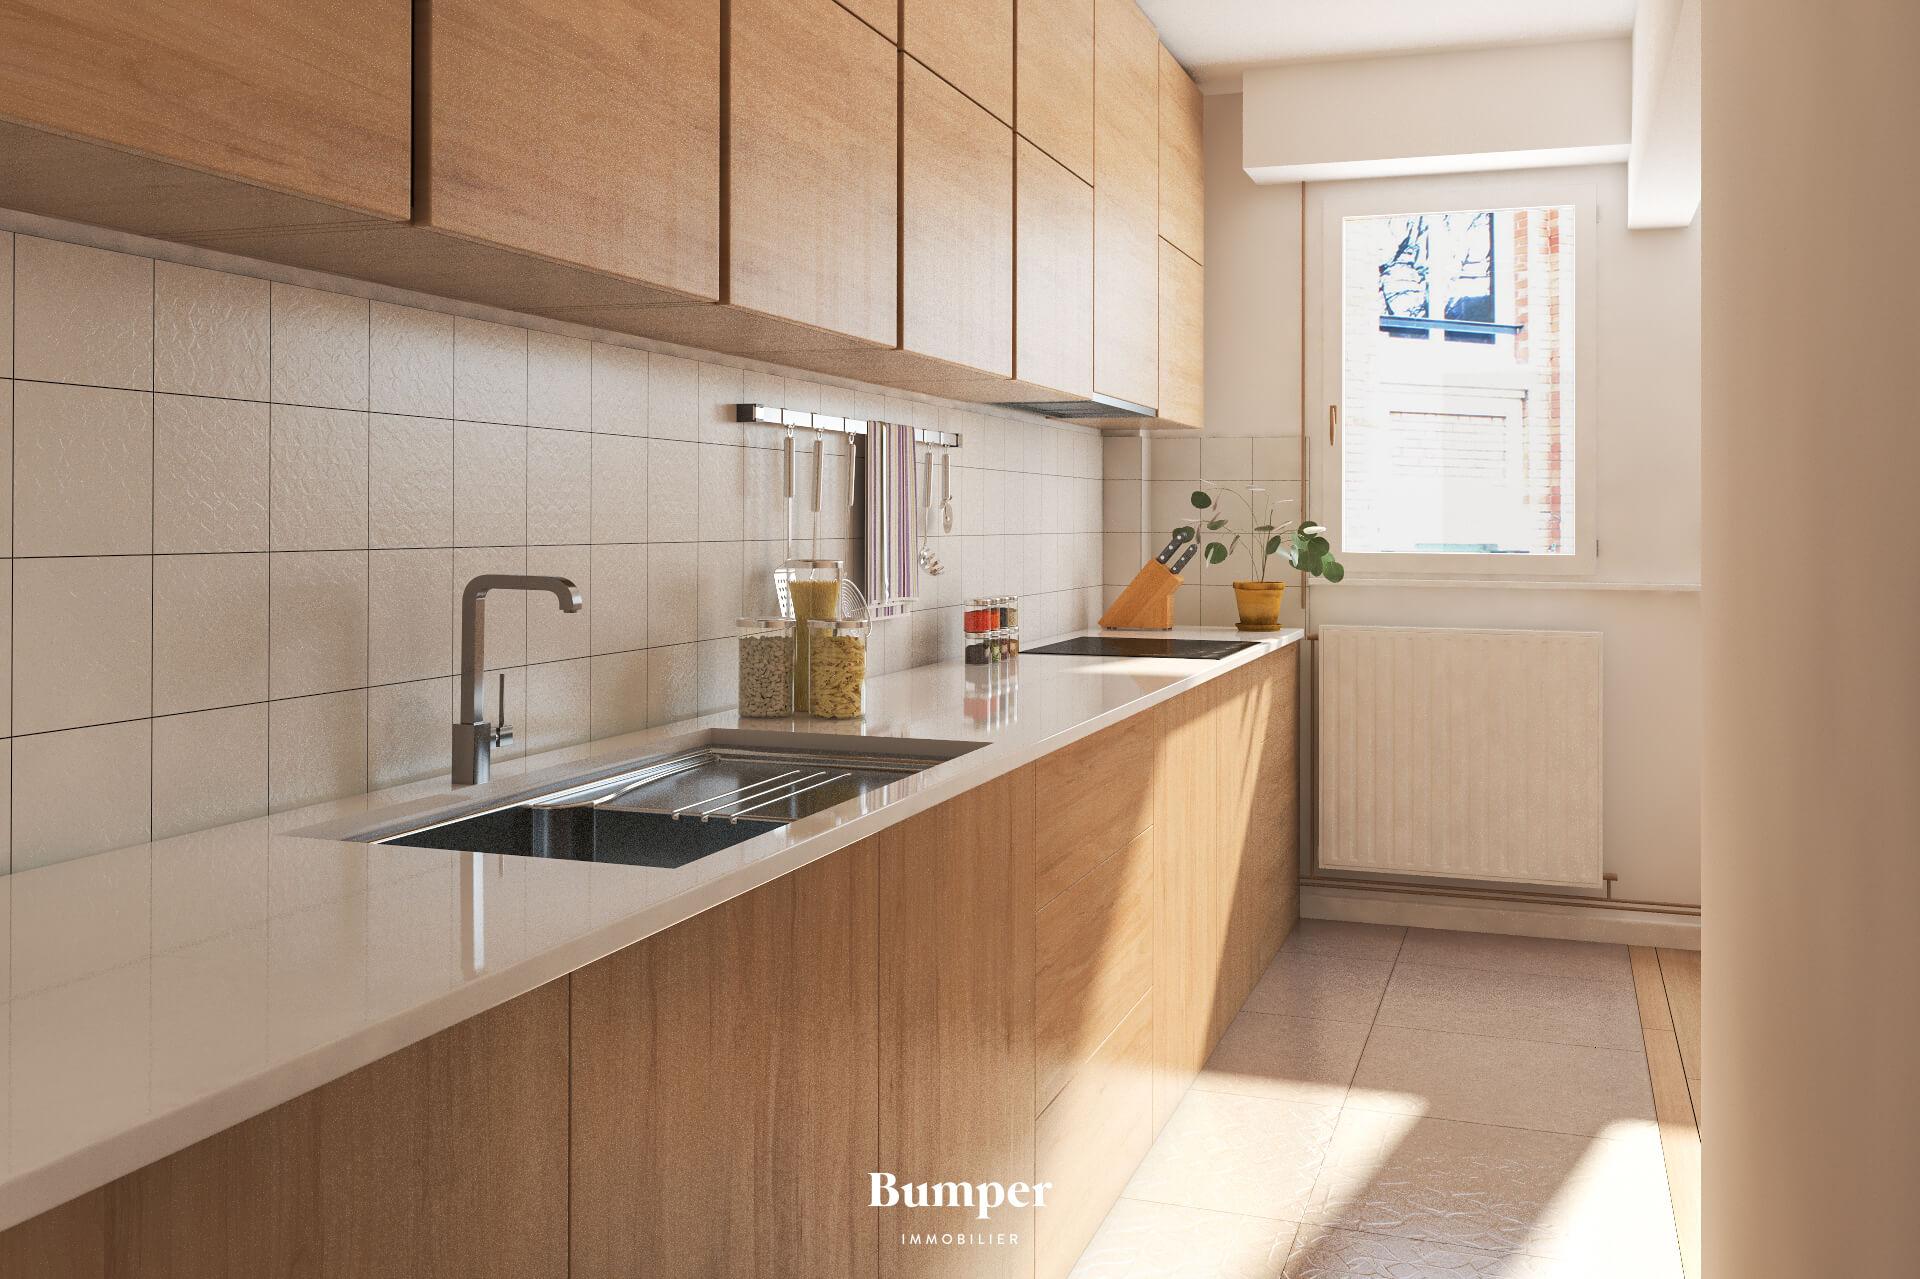 bumper-immobilier-rouen-3 copie.jpg